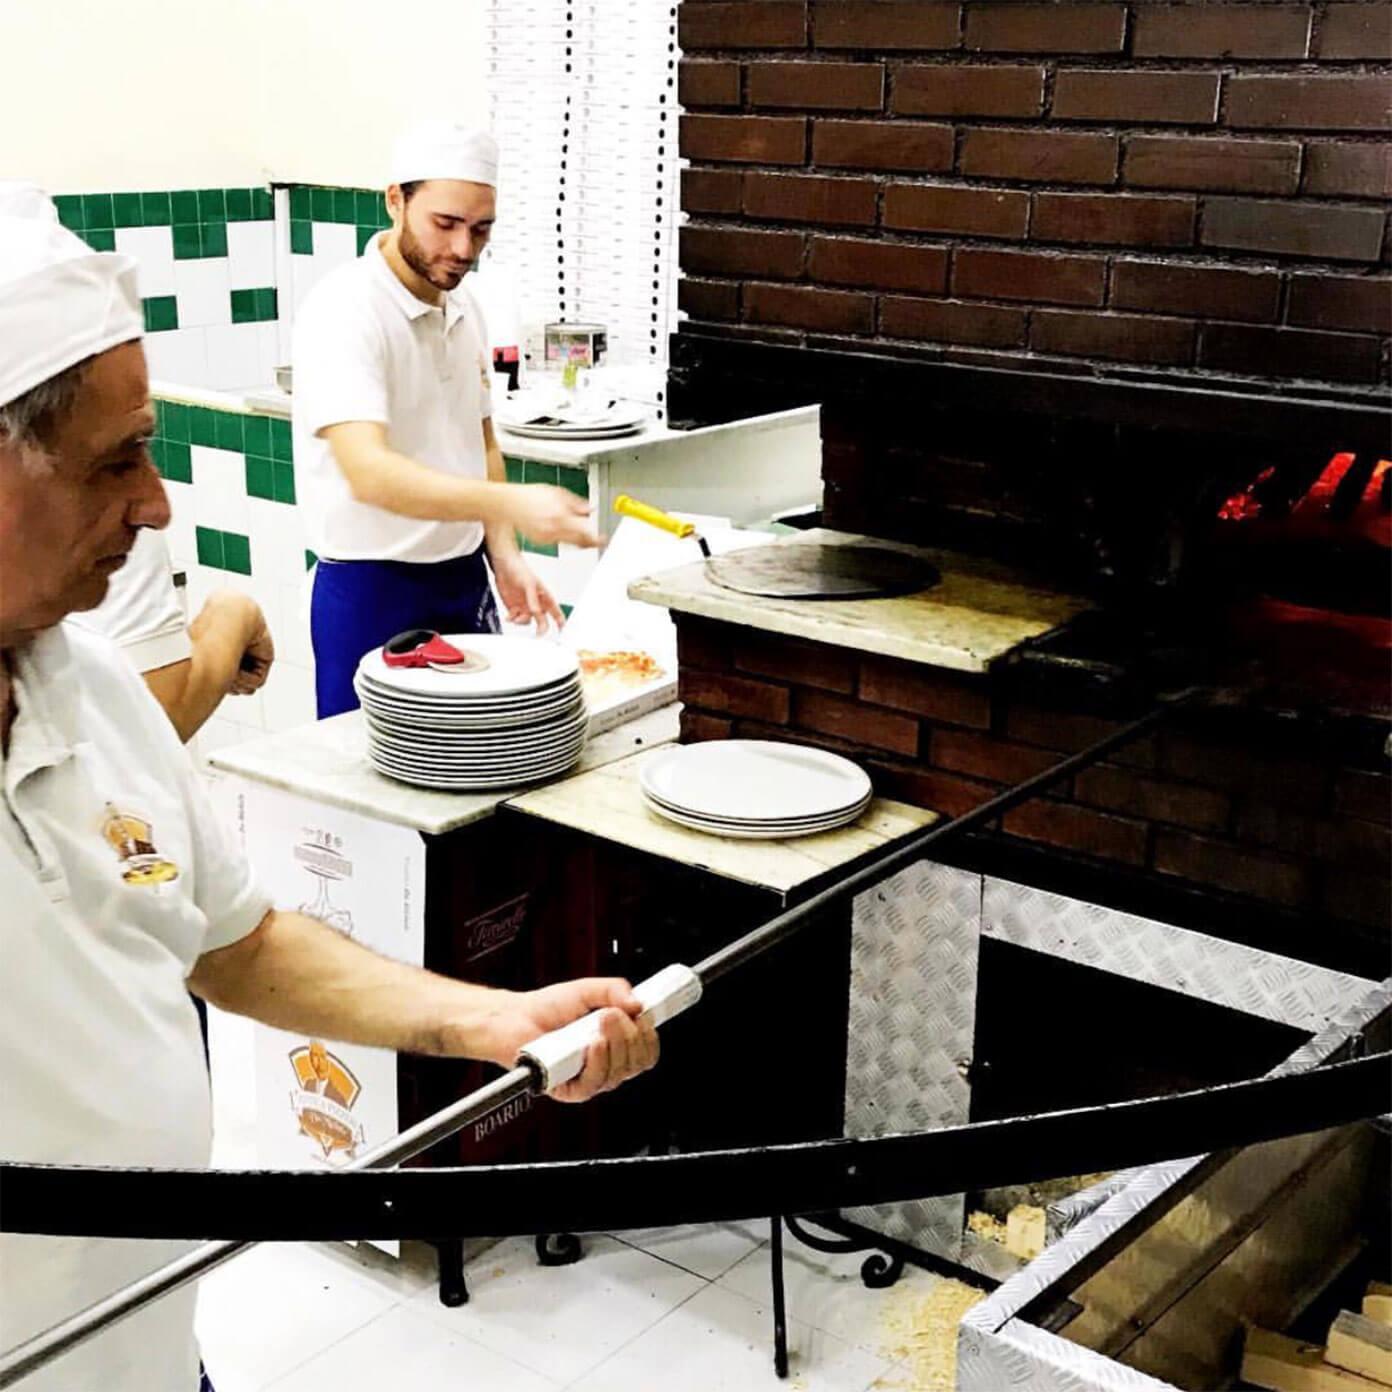 Pizzeria L'Antica da Michele in Naples